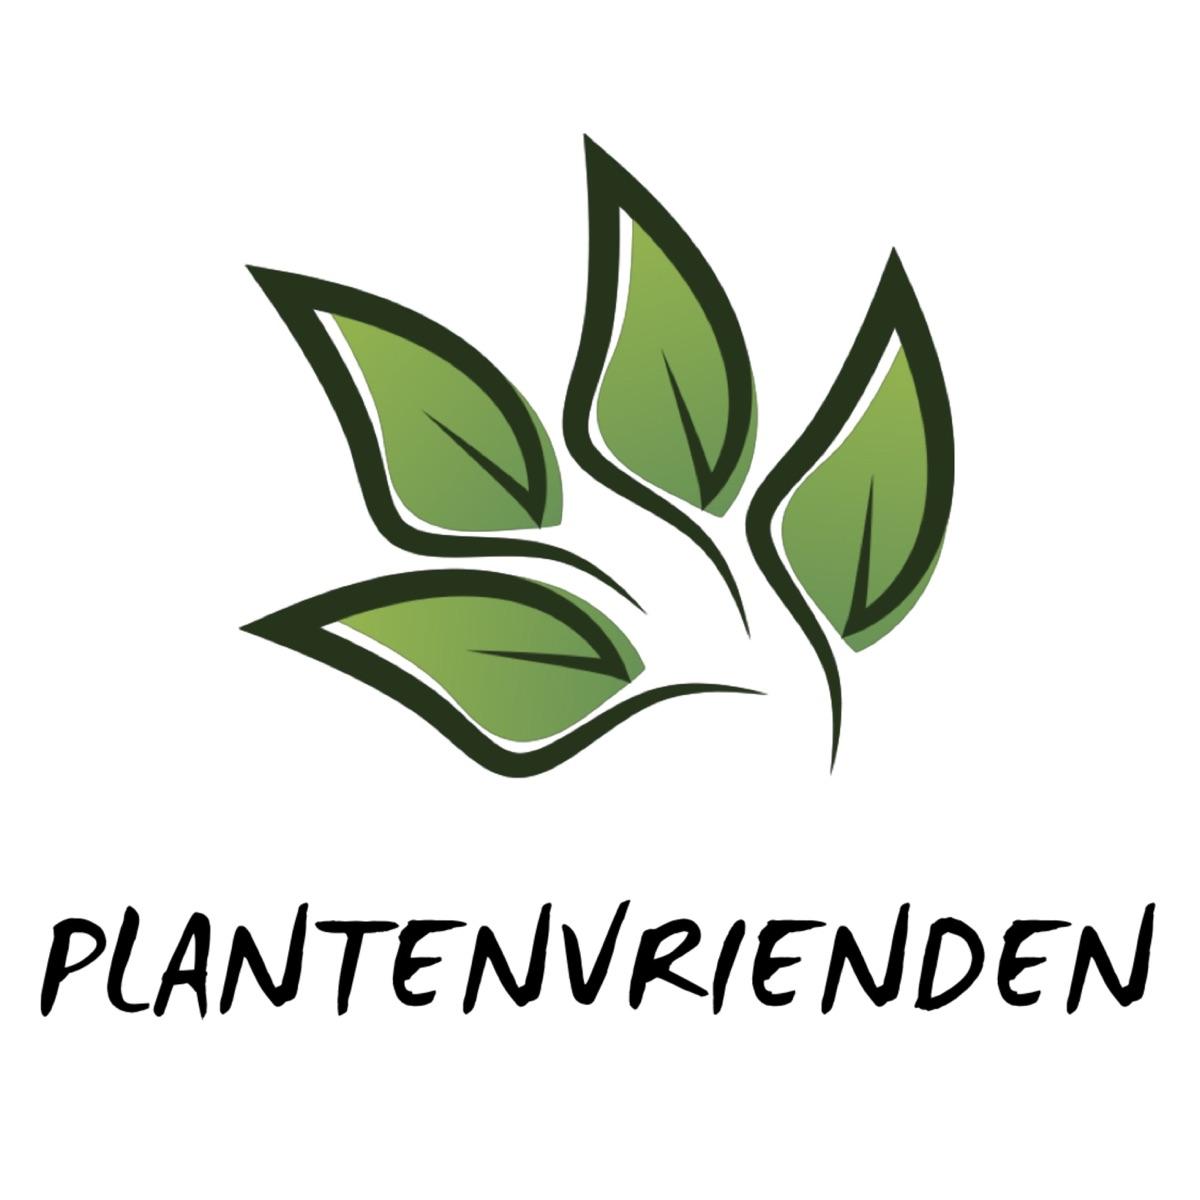 Plantenvrienden